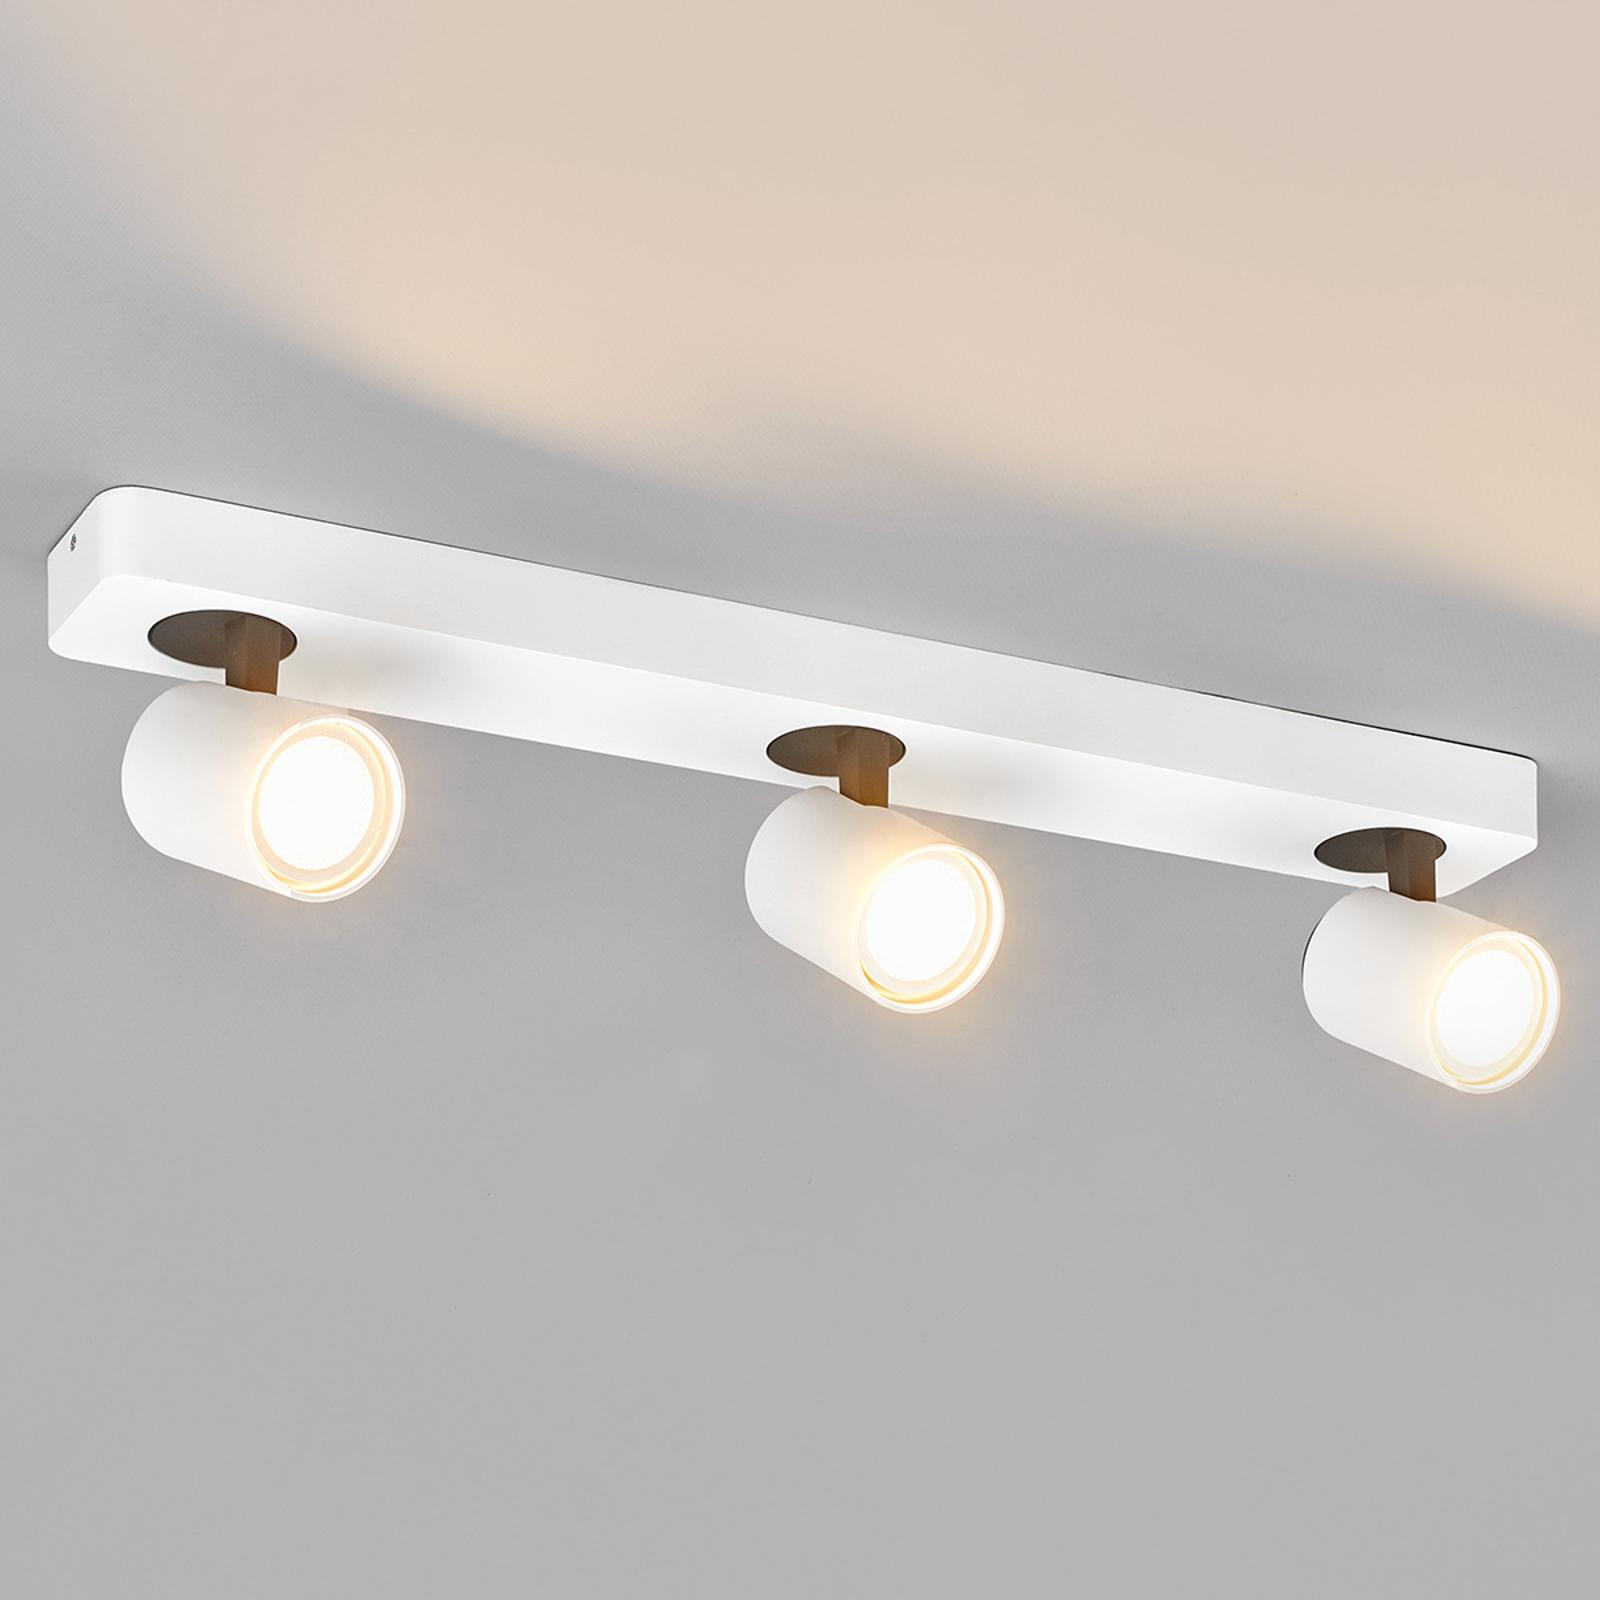 Dreiflammiger LED-Strahler Sean in Weiß